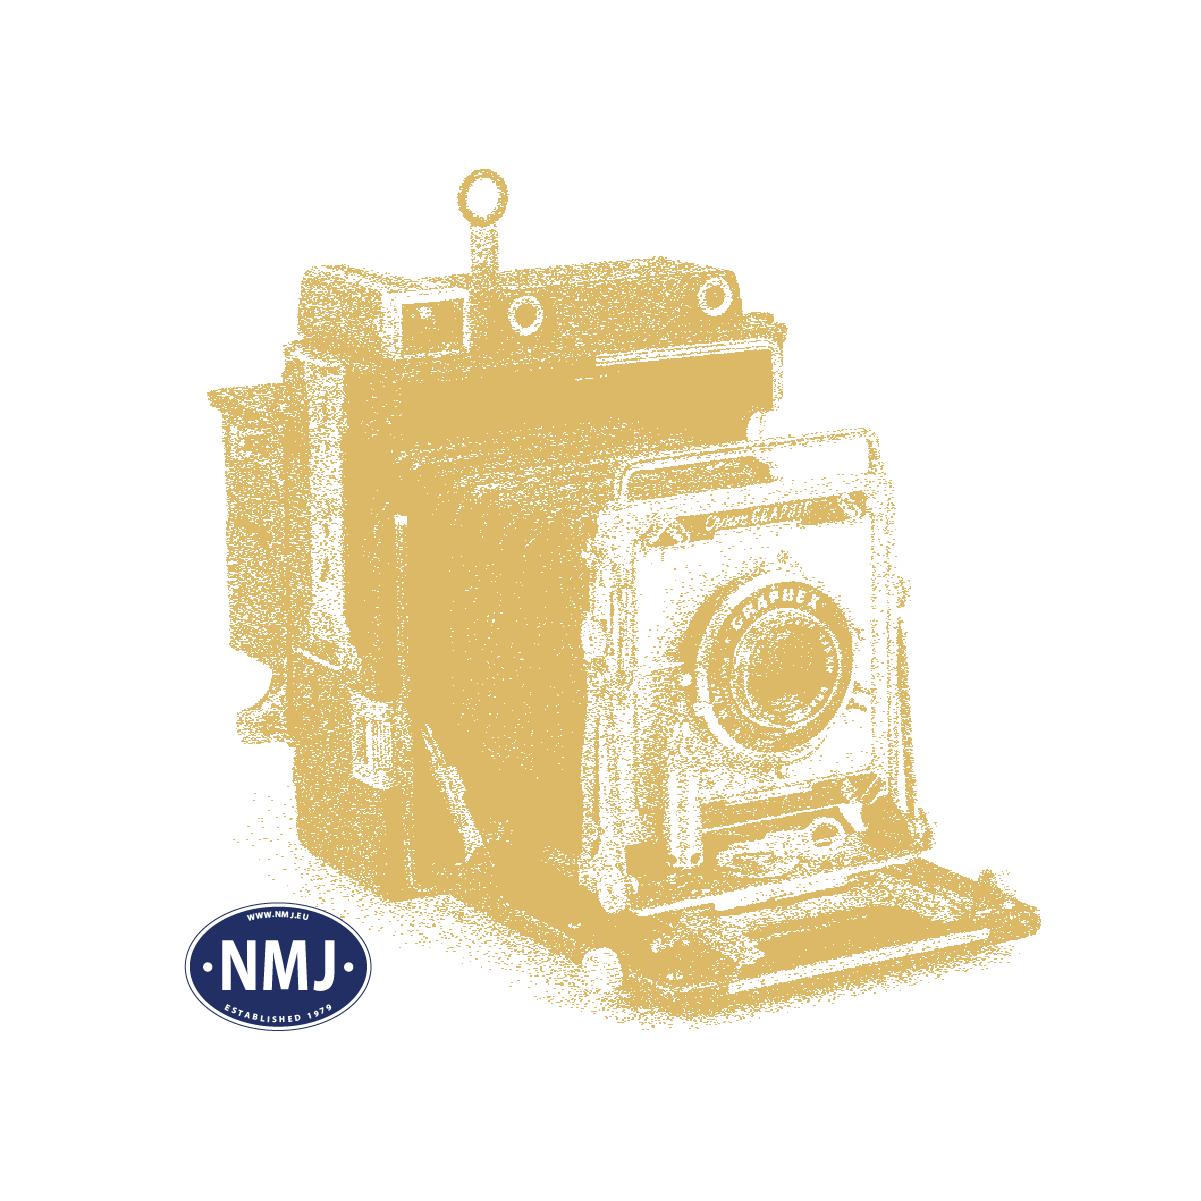 NMJT83.212 - NMJ Topline NSB Skd 224.216, DCC Digital